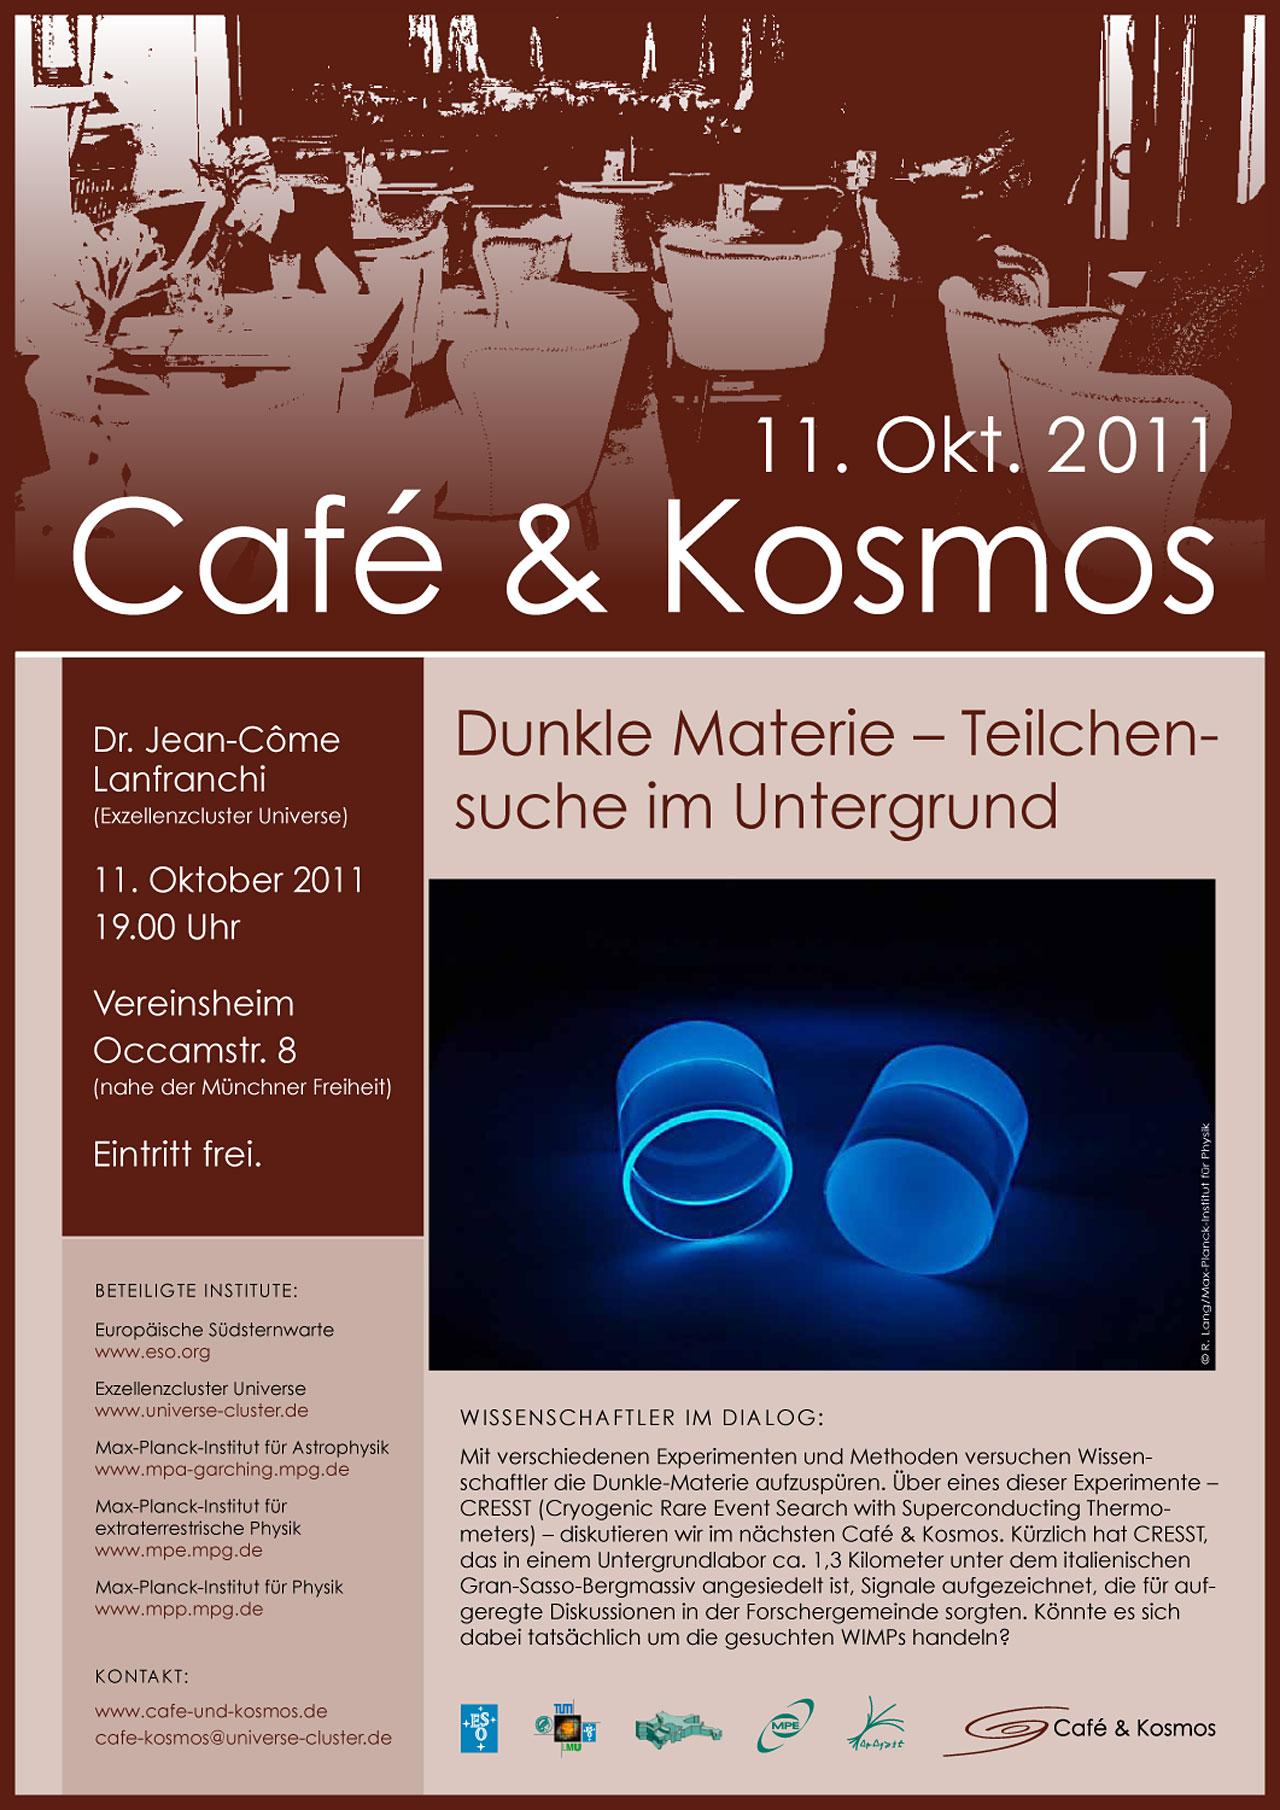 Poster: Café & Kosmos — Dunkle Materie